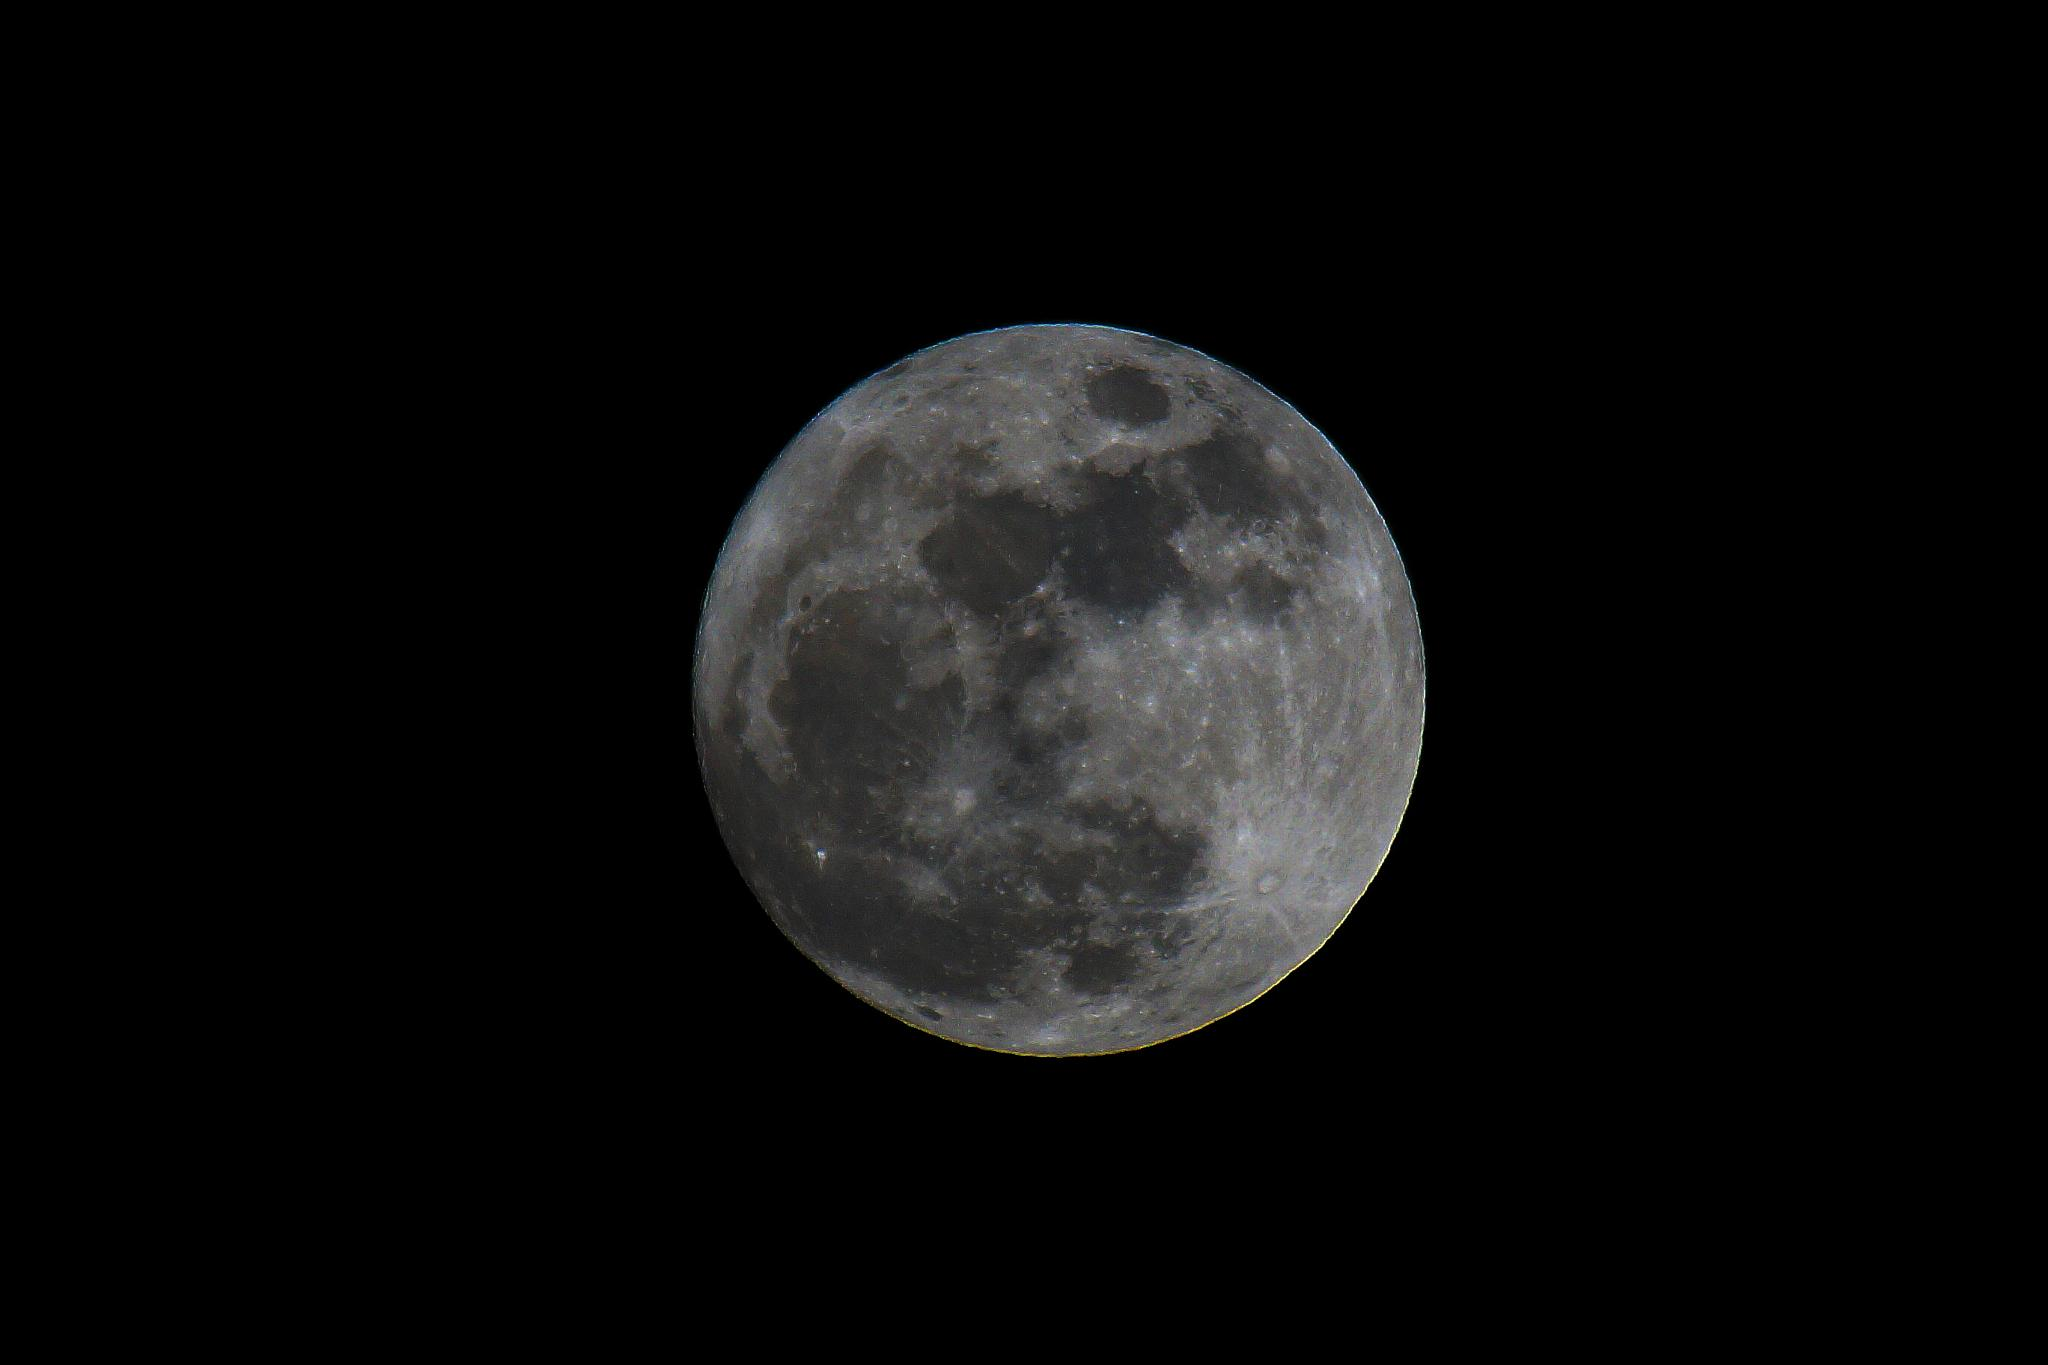 The Moon,feb3rd2015 by claypole55